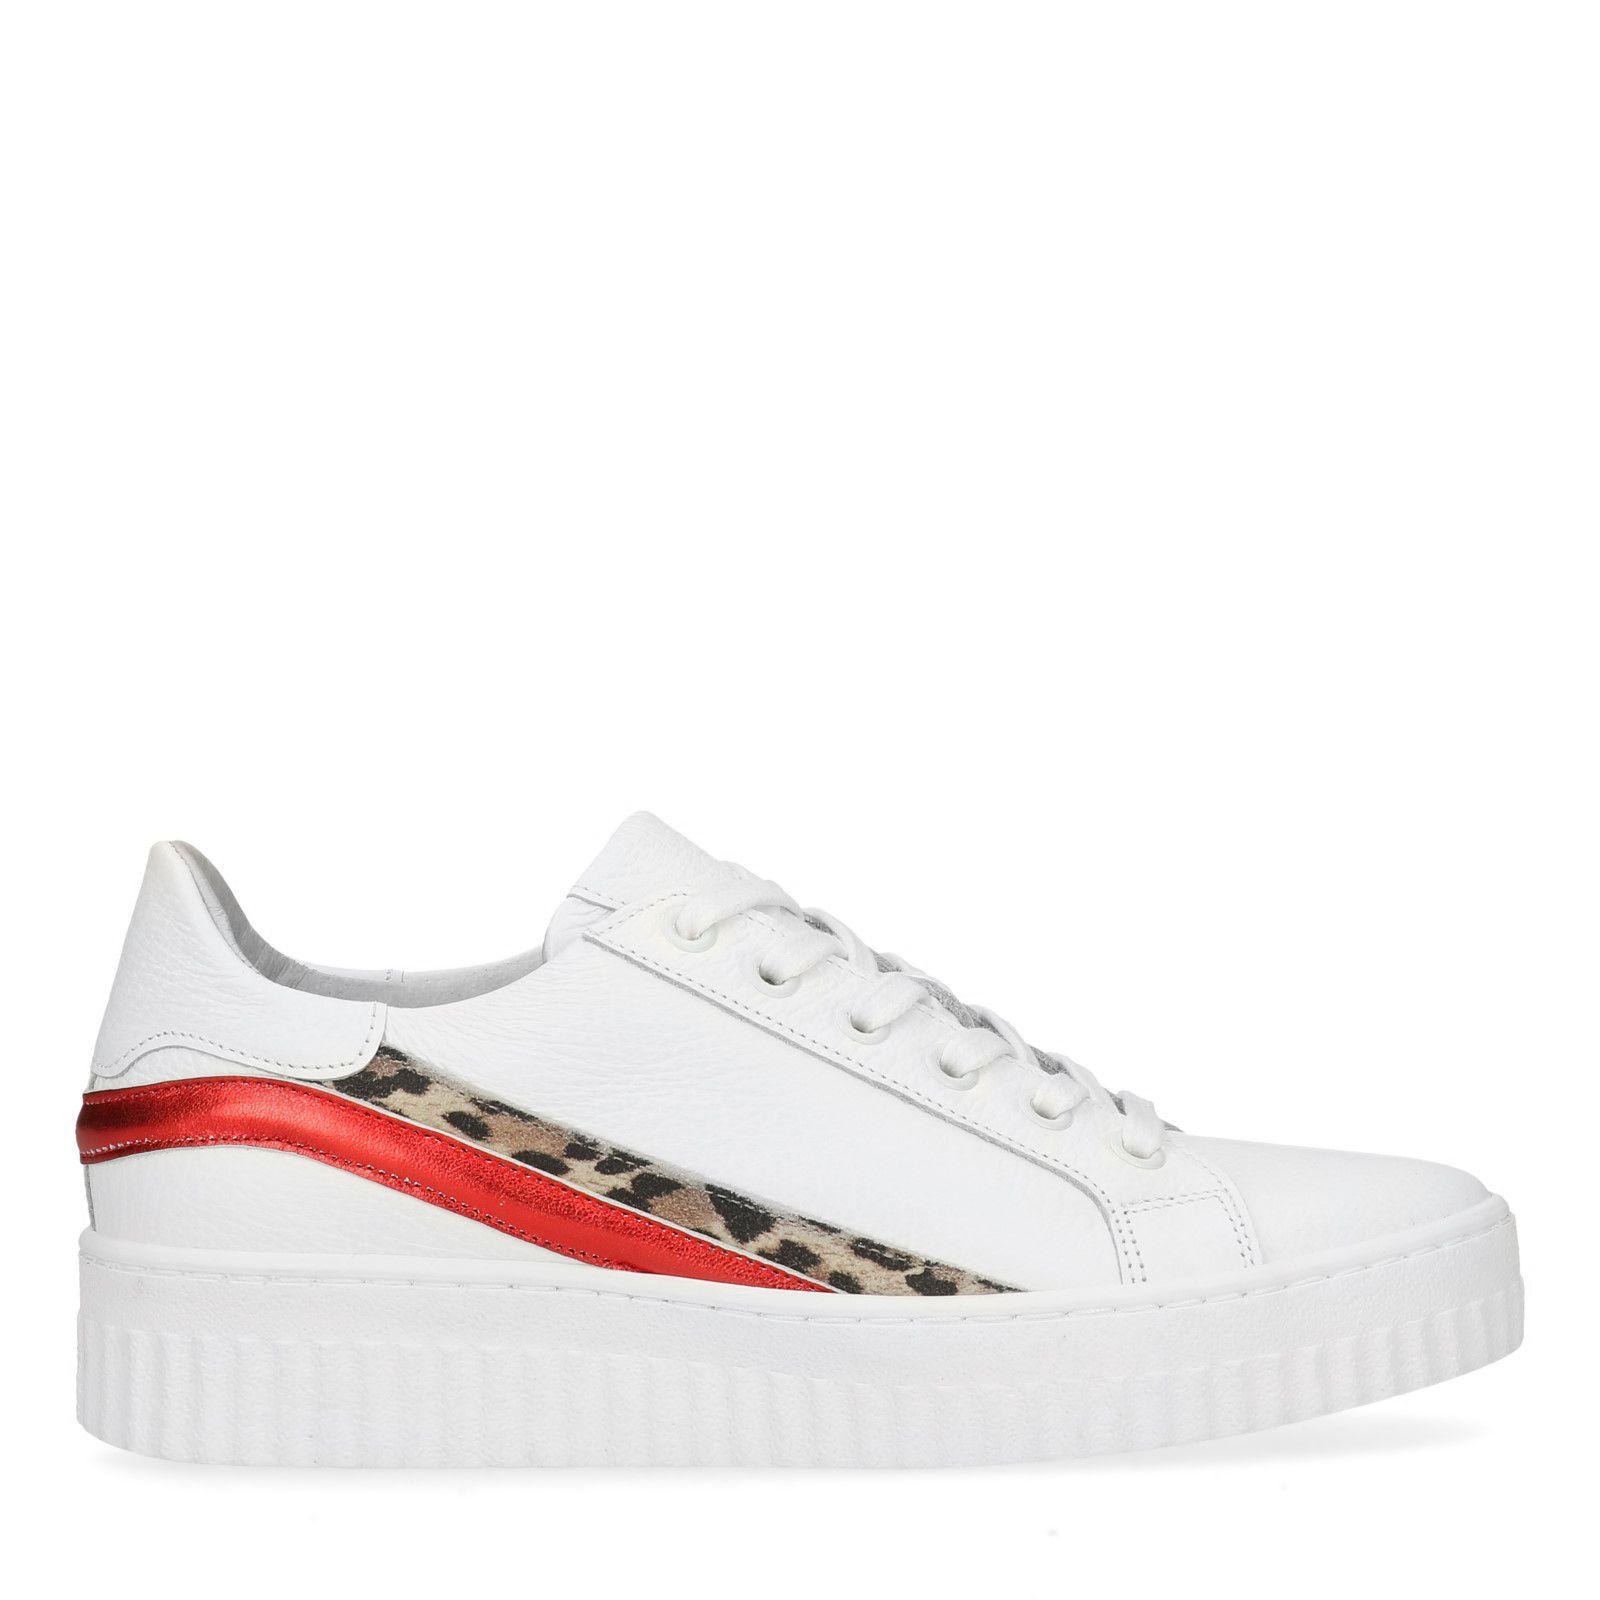 074f2f7a56d Witte platform sneakers met details - Dames   MANFIELD